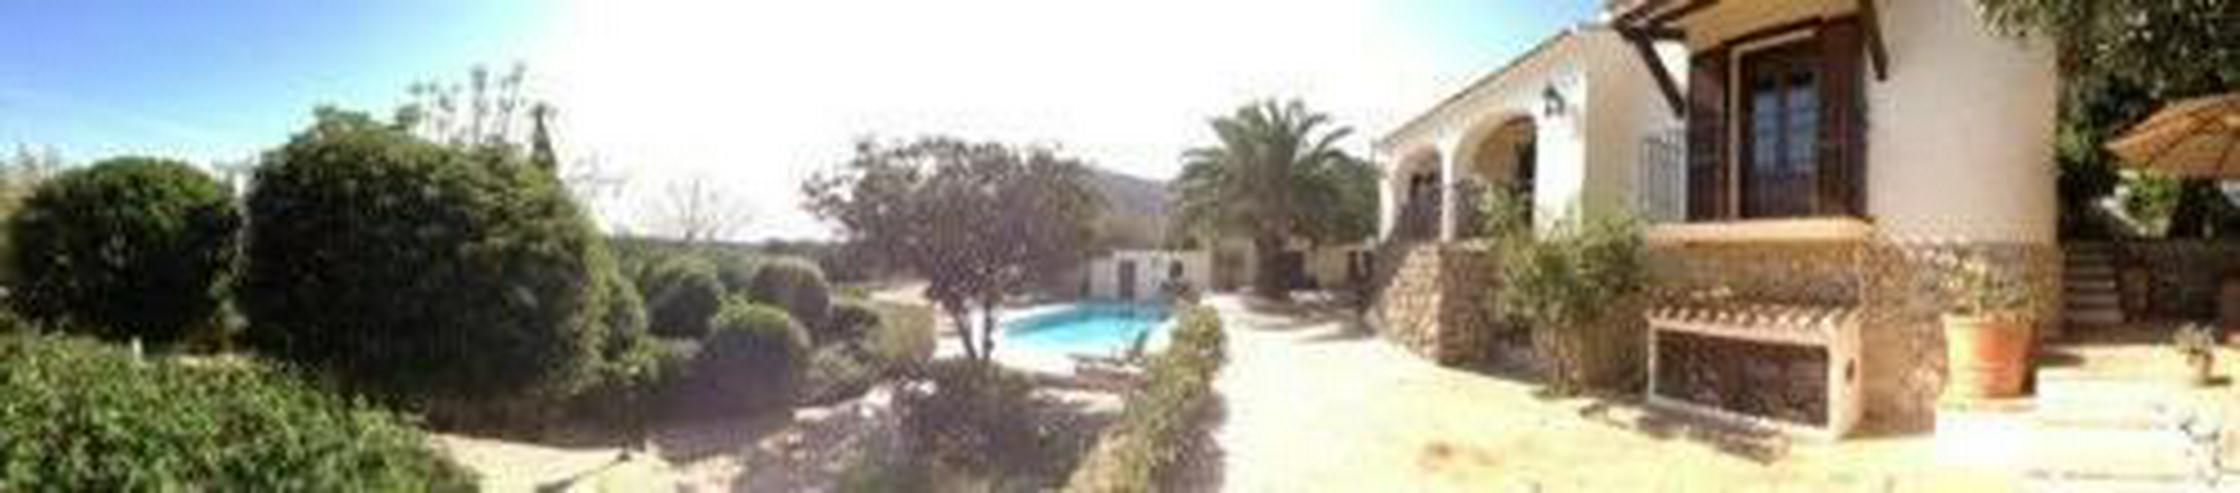 Bild 2: Großzügige Villa mit Pool in La Xara